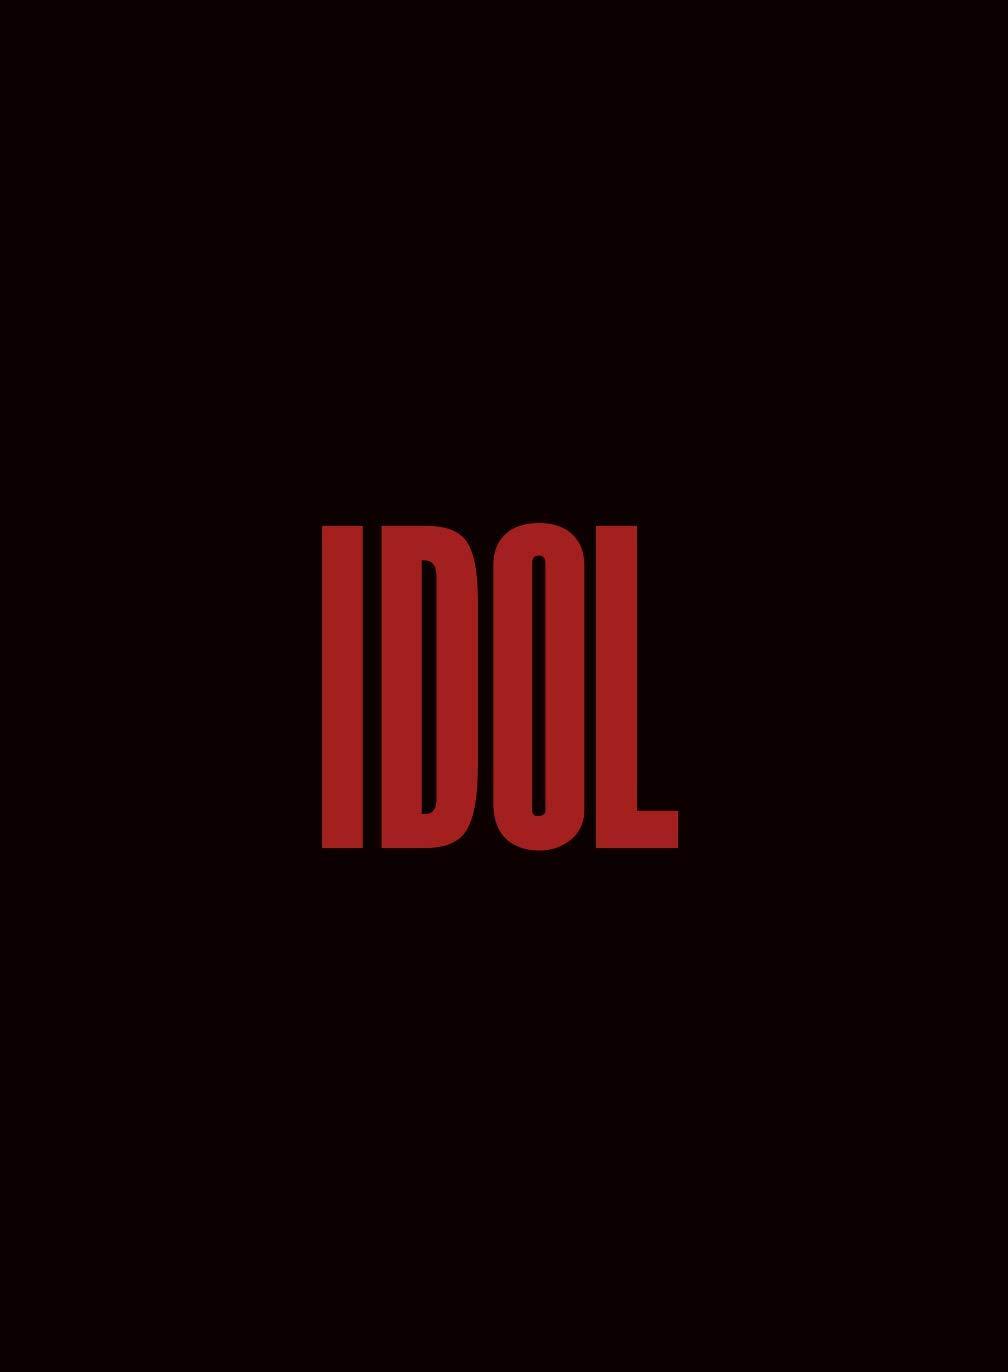 IDOL (Photobook)